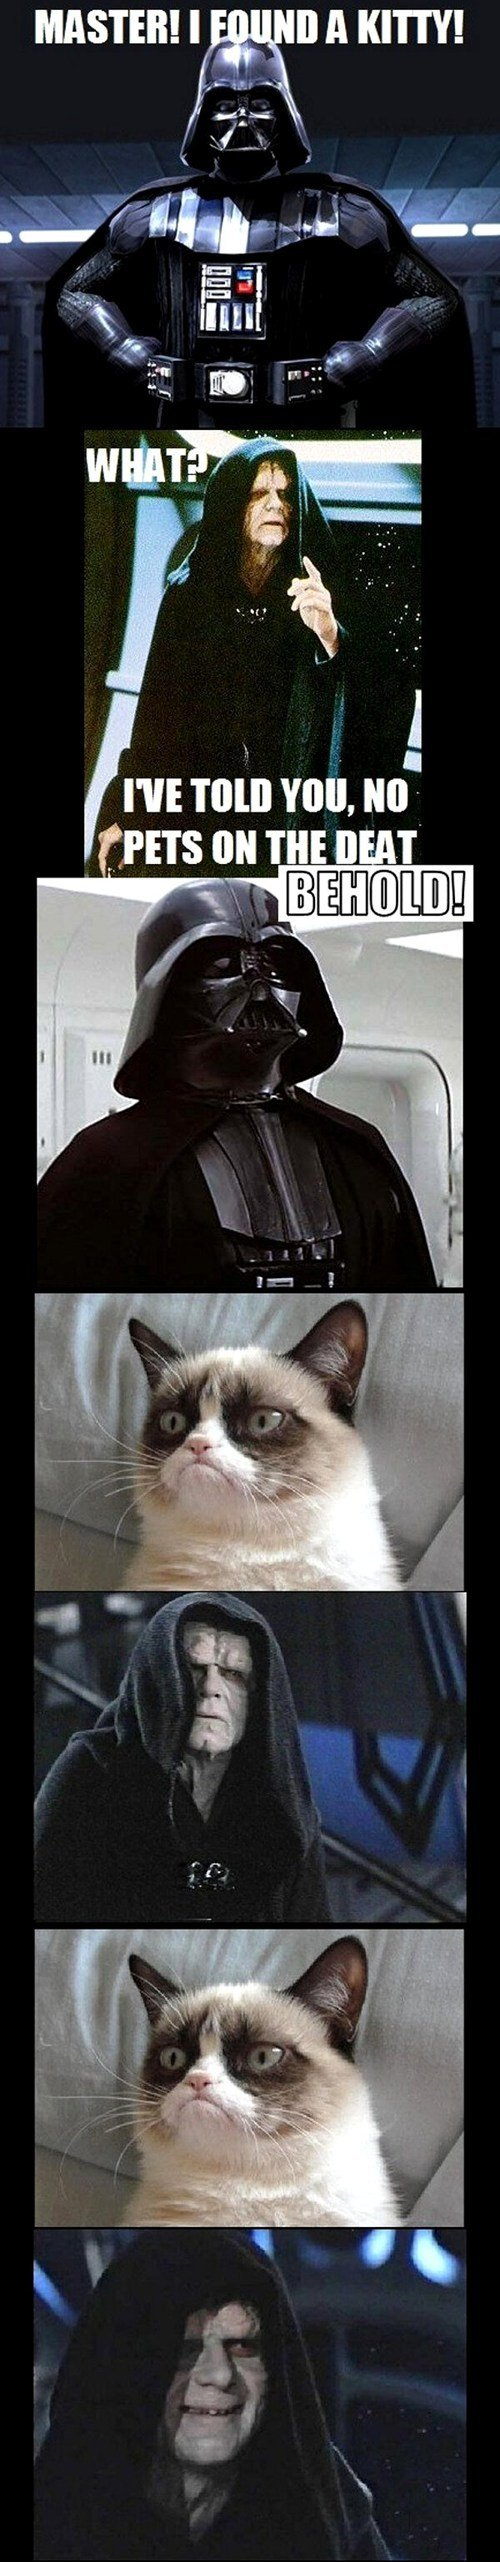 Dark side cat